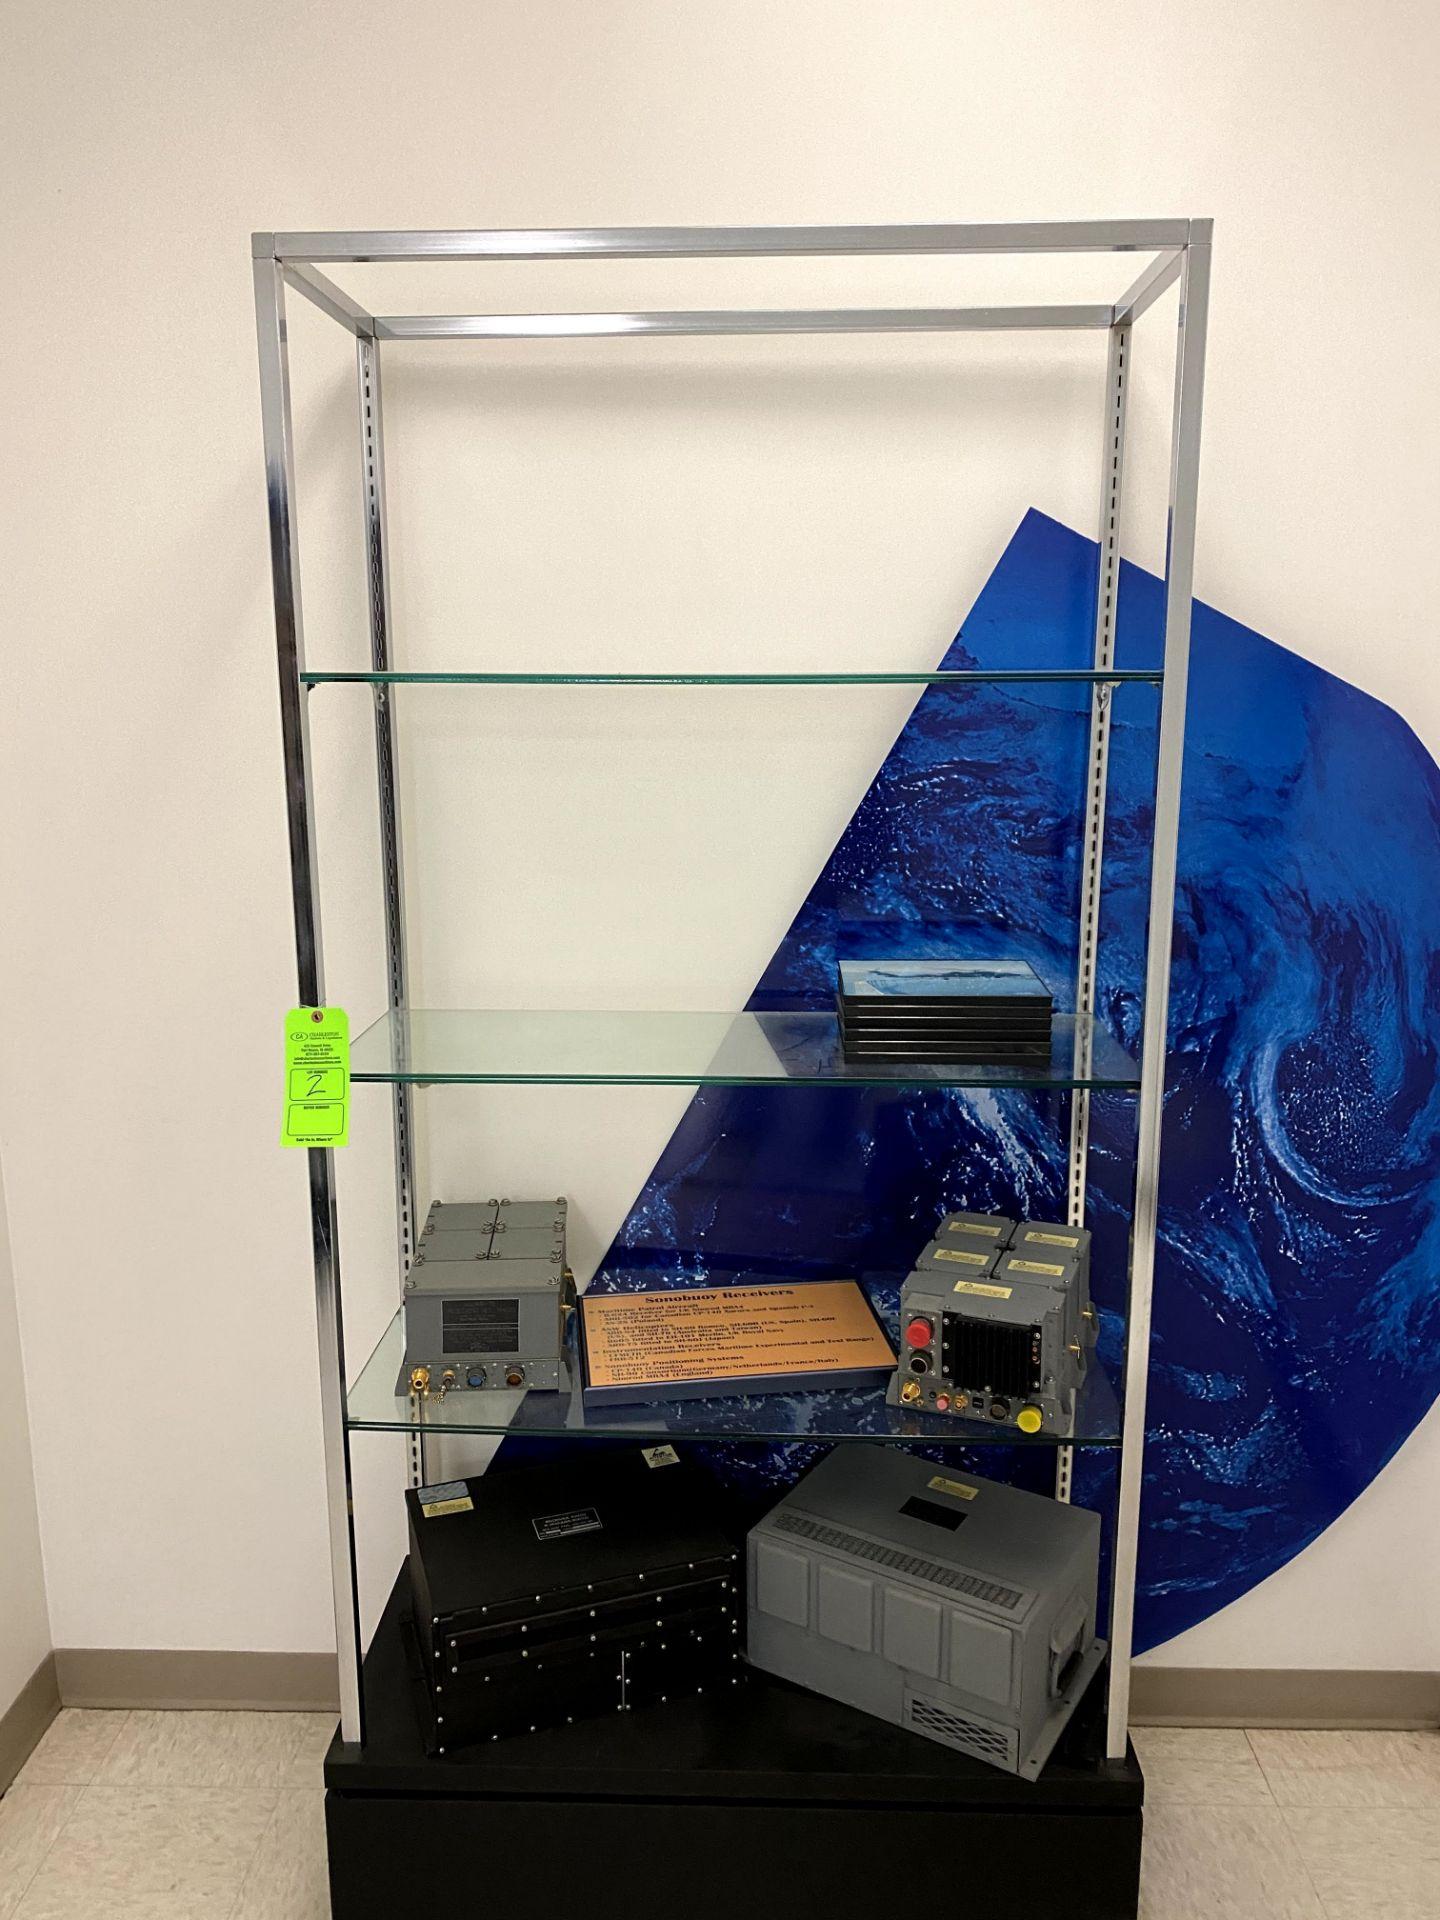 GLASS DISPLAY SHELF (SHELF ONLY) -- (7625 OMNITECH PLACE VICTOR NEW YORK)